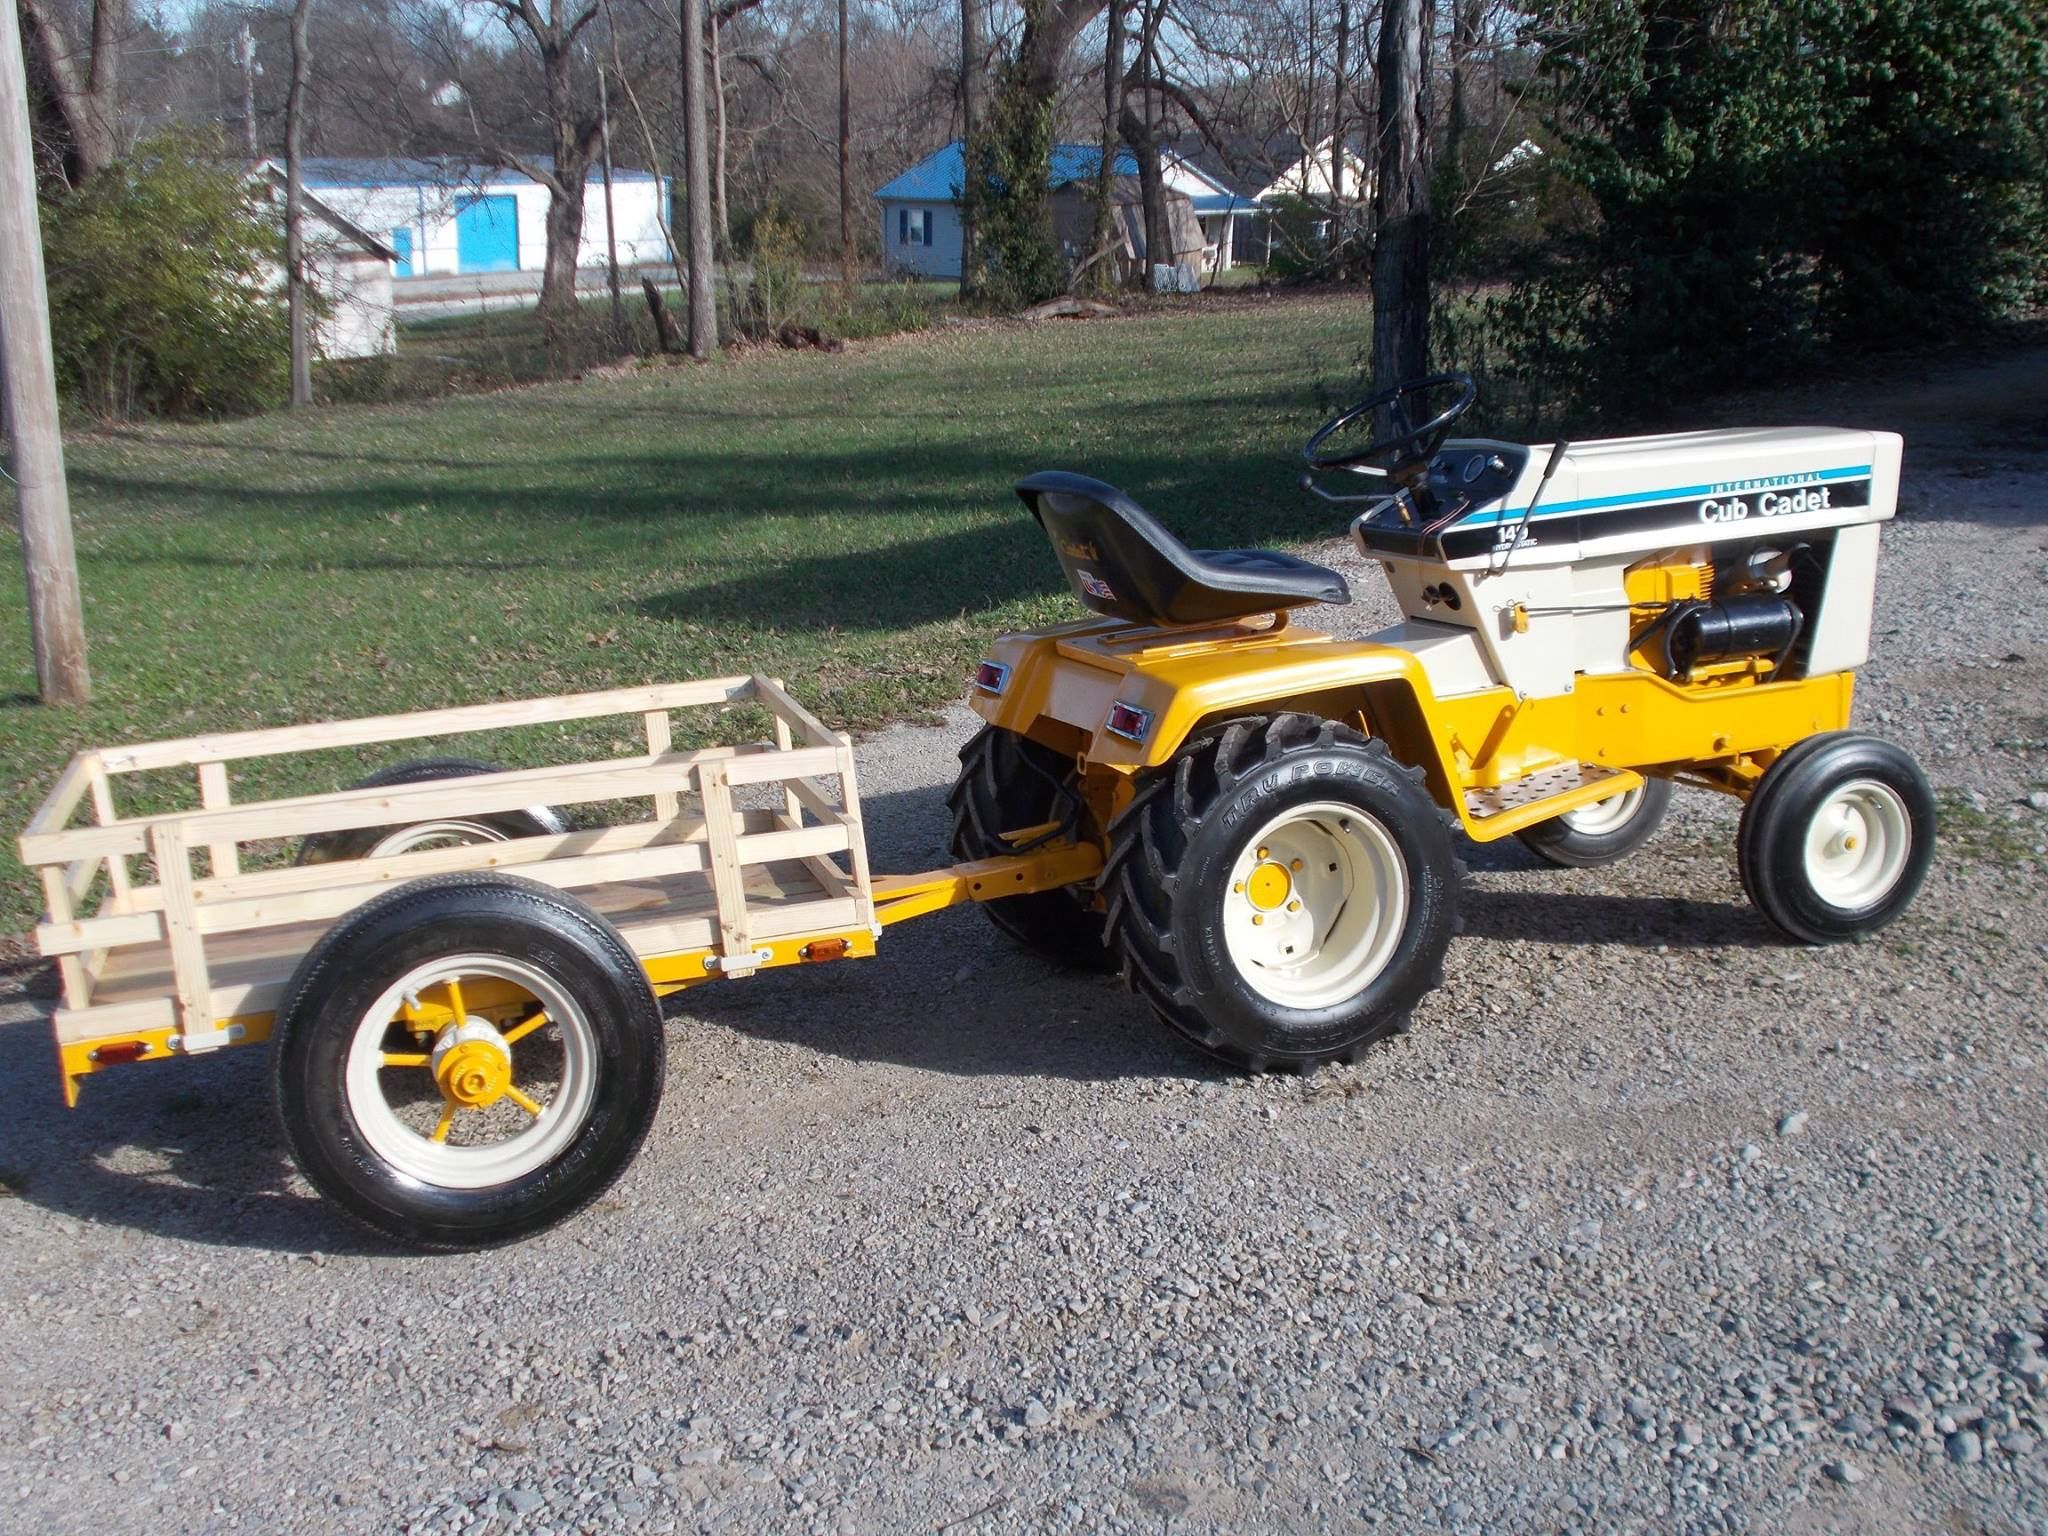 cub cadet 149 garden tractor an very nice custom wagontrailer - Garden Tractor Trailer